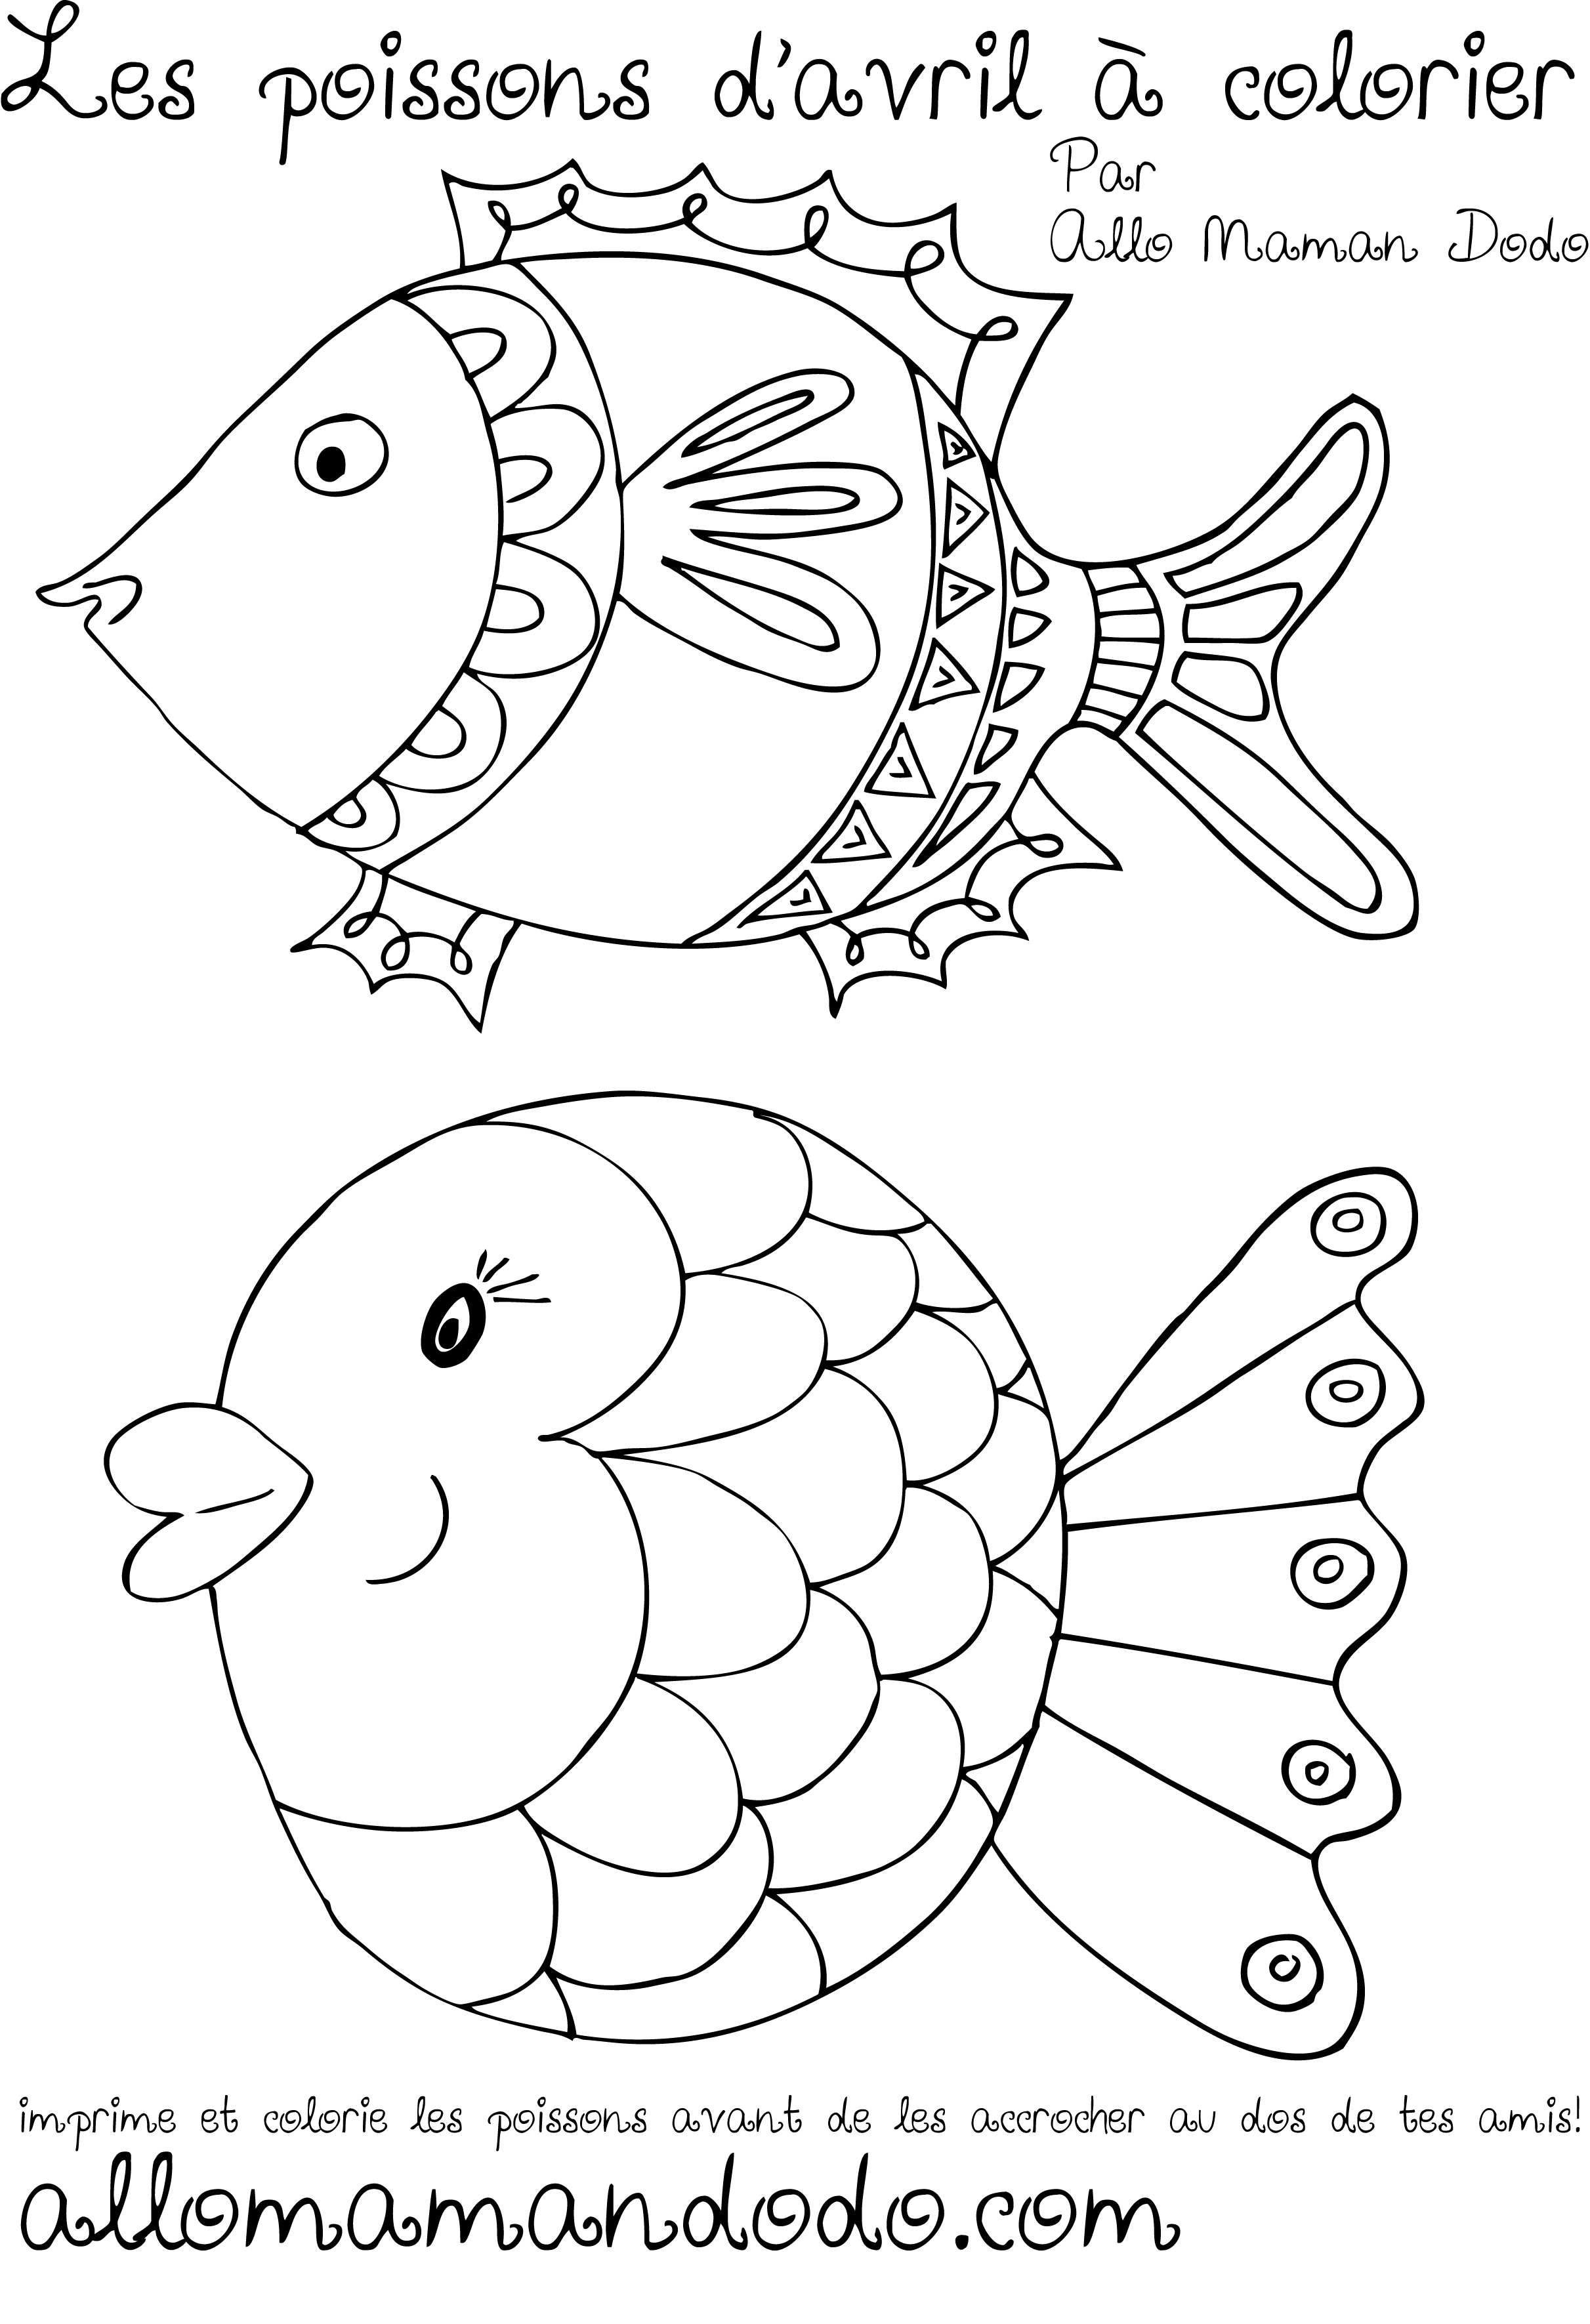 Des poissons imprimer colorier et accrocher poisson d 39 avril allo maman dodo - Poisson d avril dessin imprimer ...